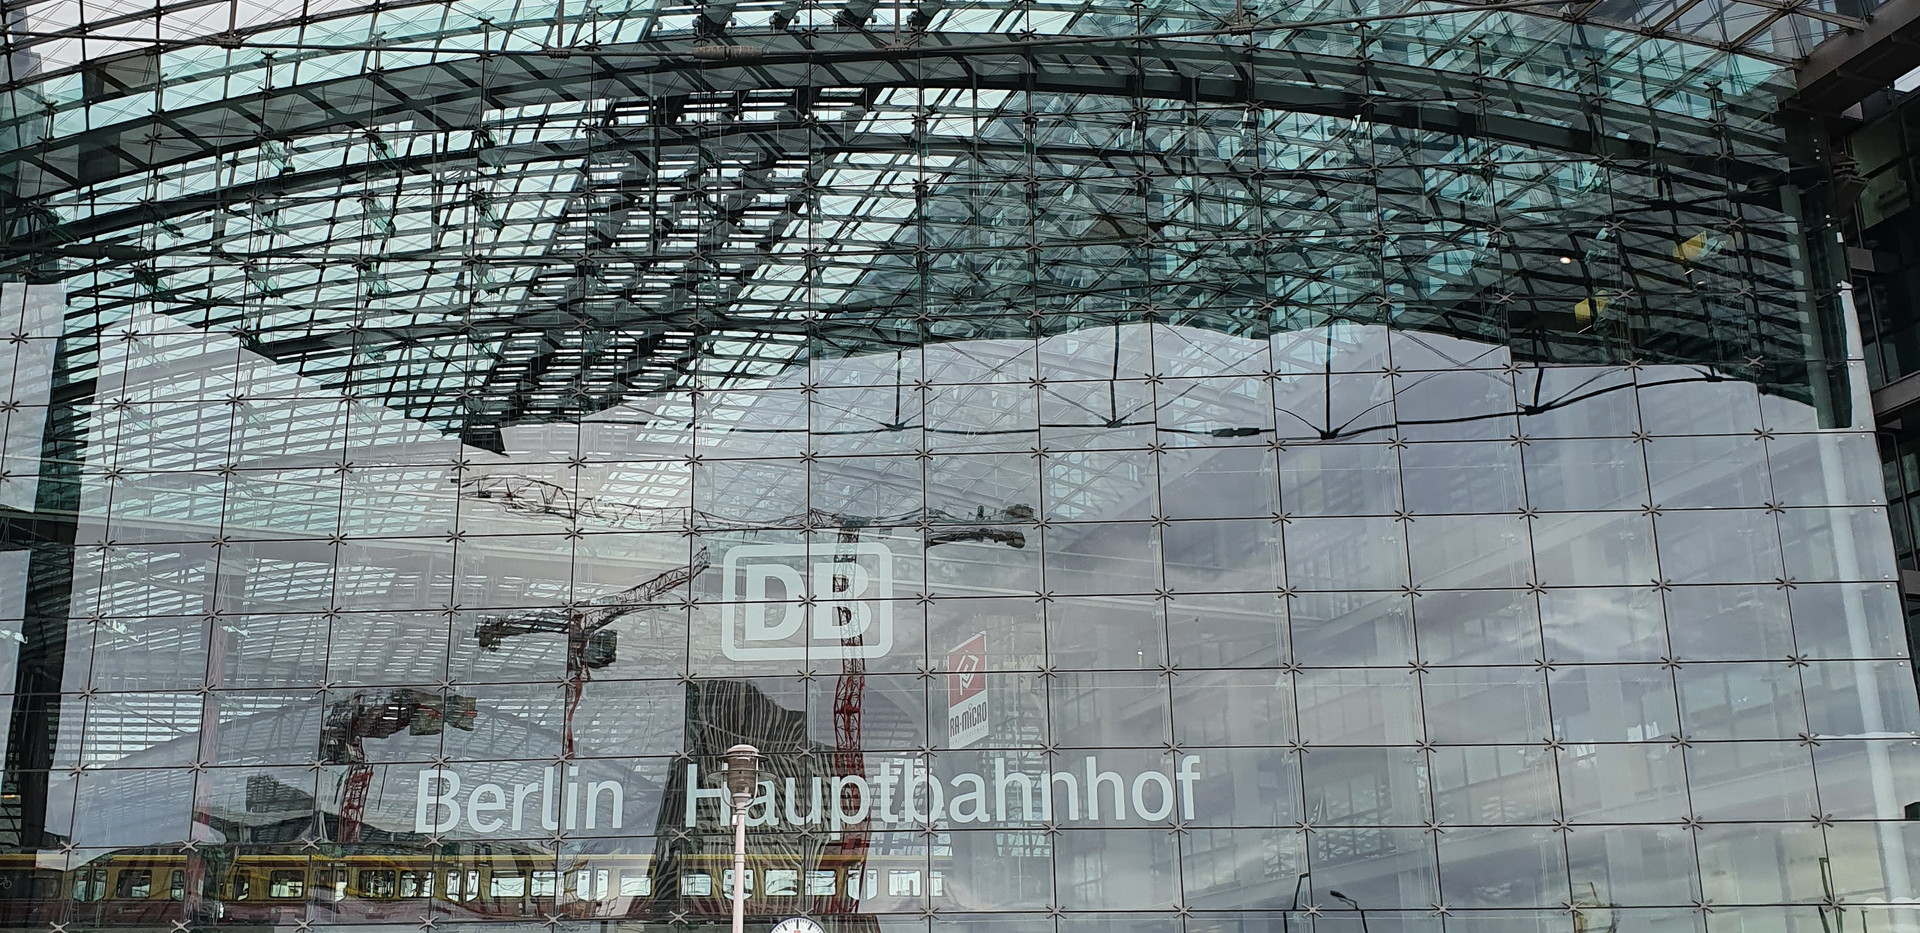 Berlin Main Station!